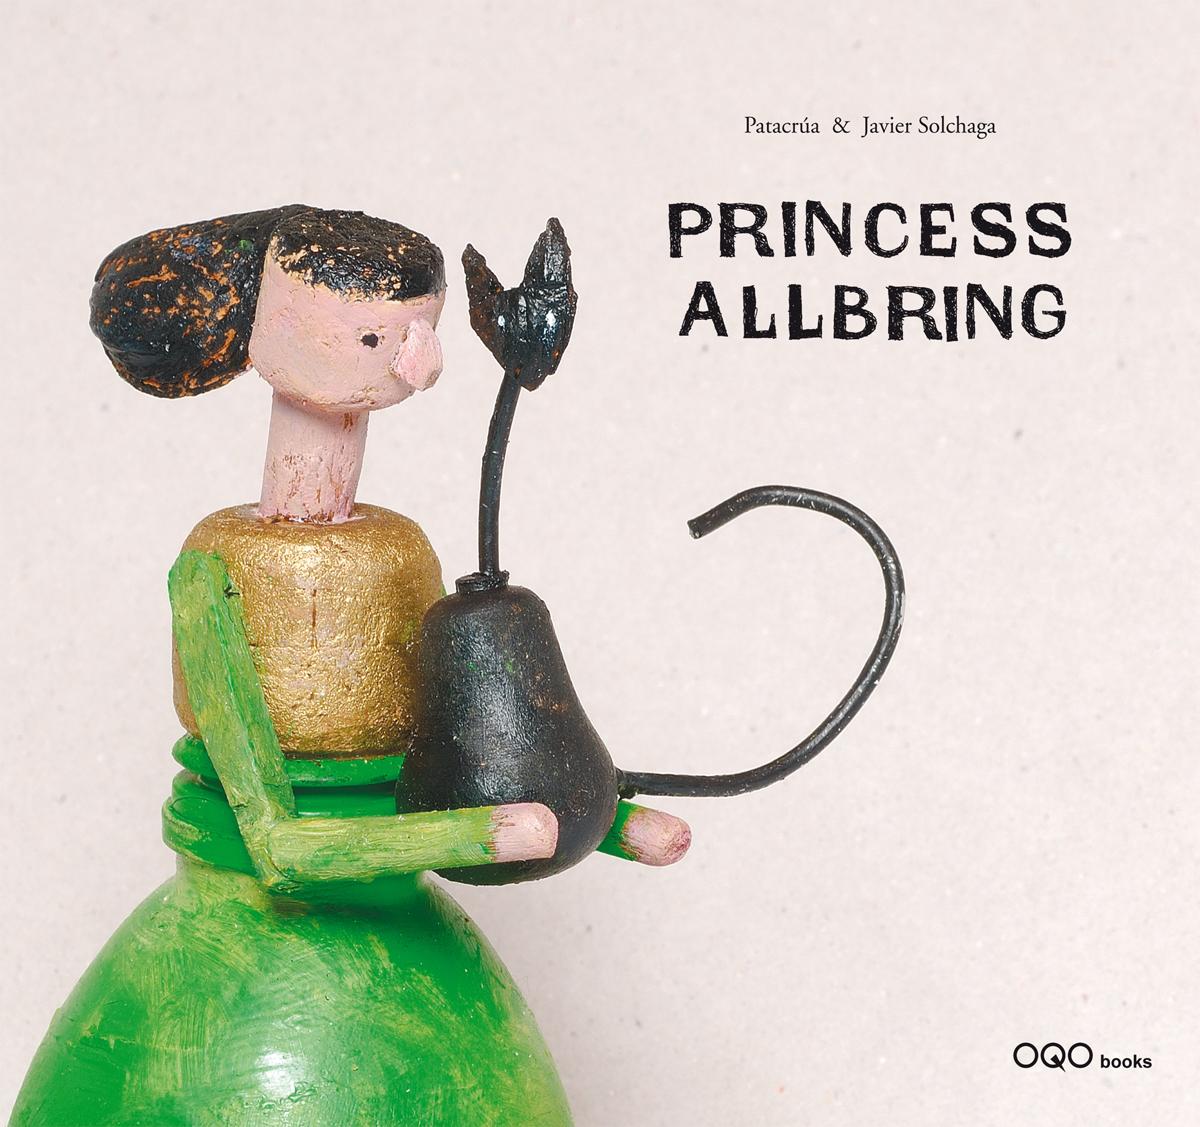 Princess Allbring